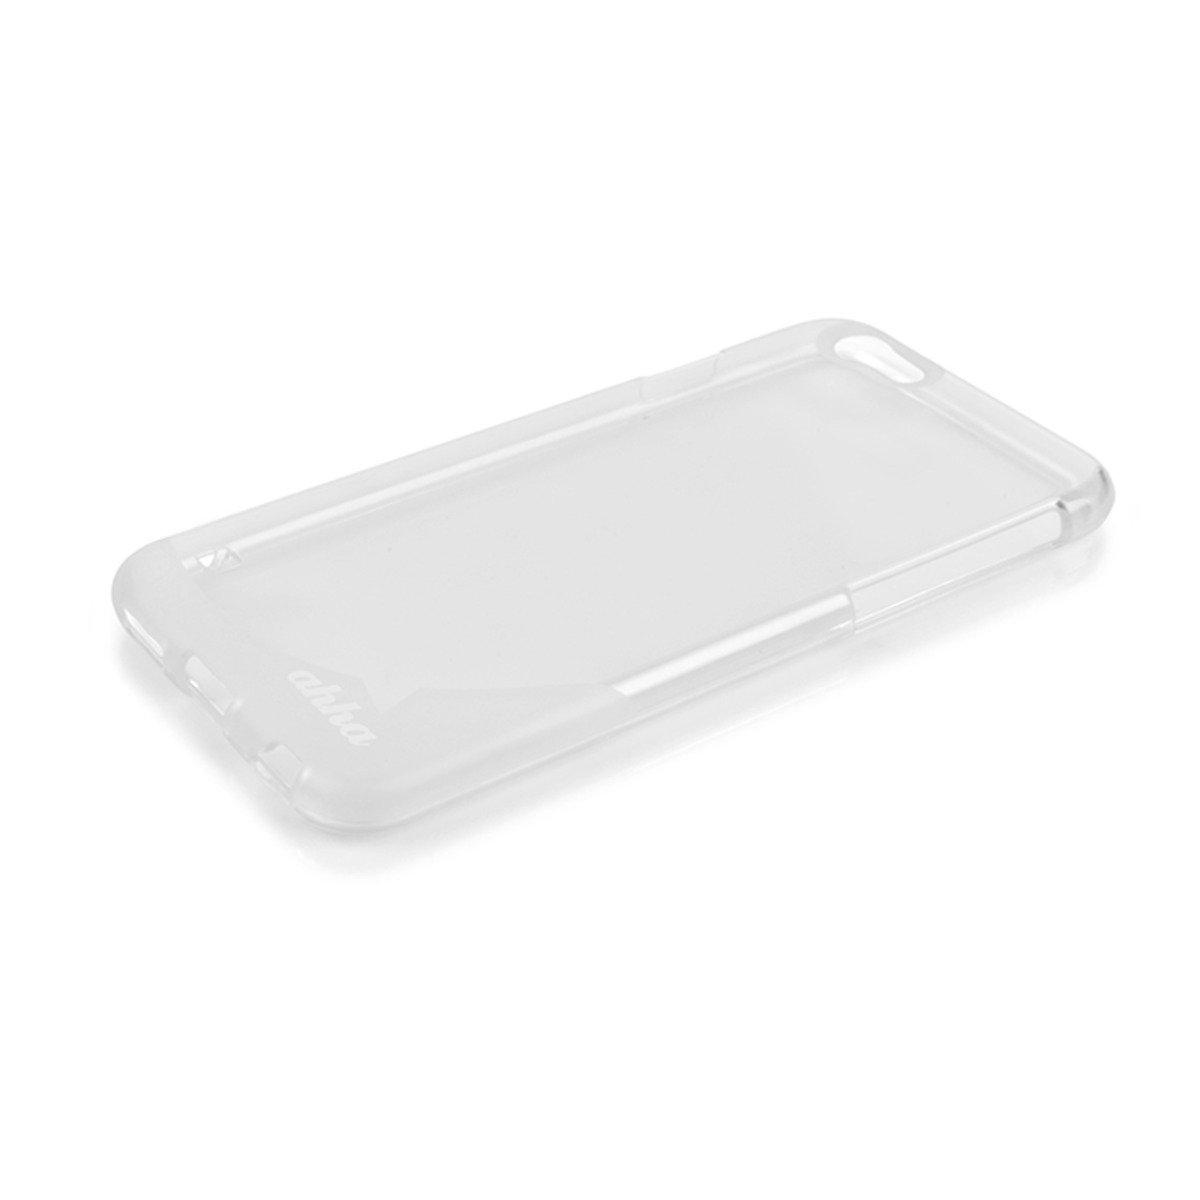 iPhone 6, 6s 手機保護殼 GummiShell MOYA (白)